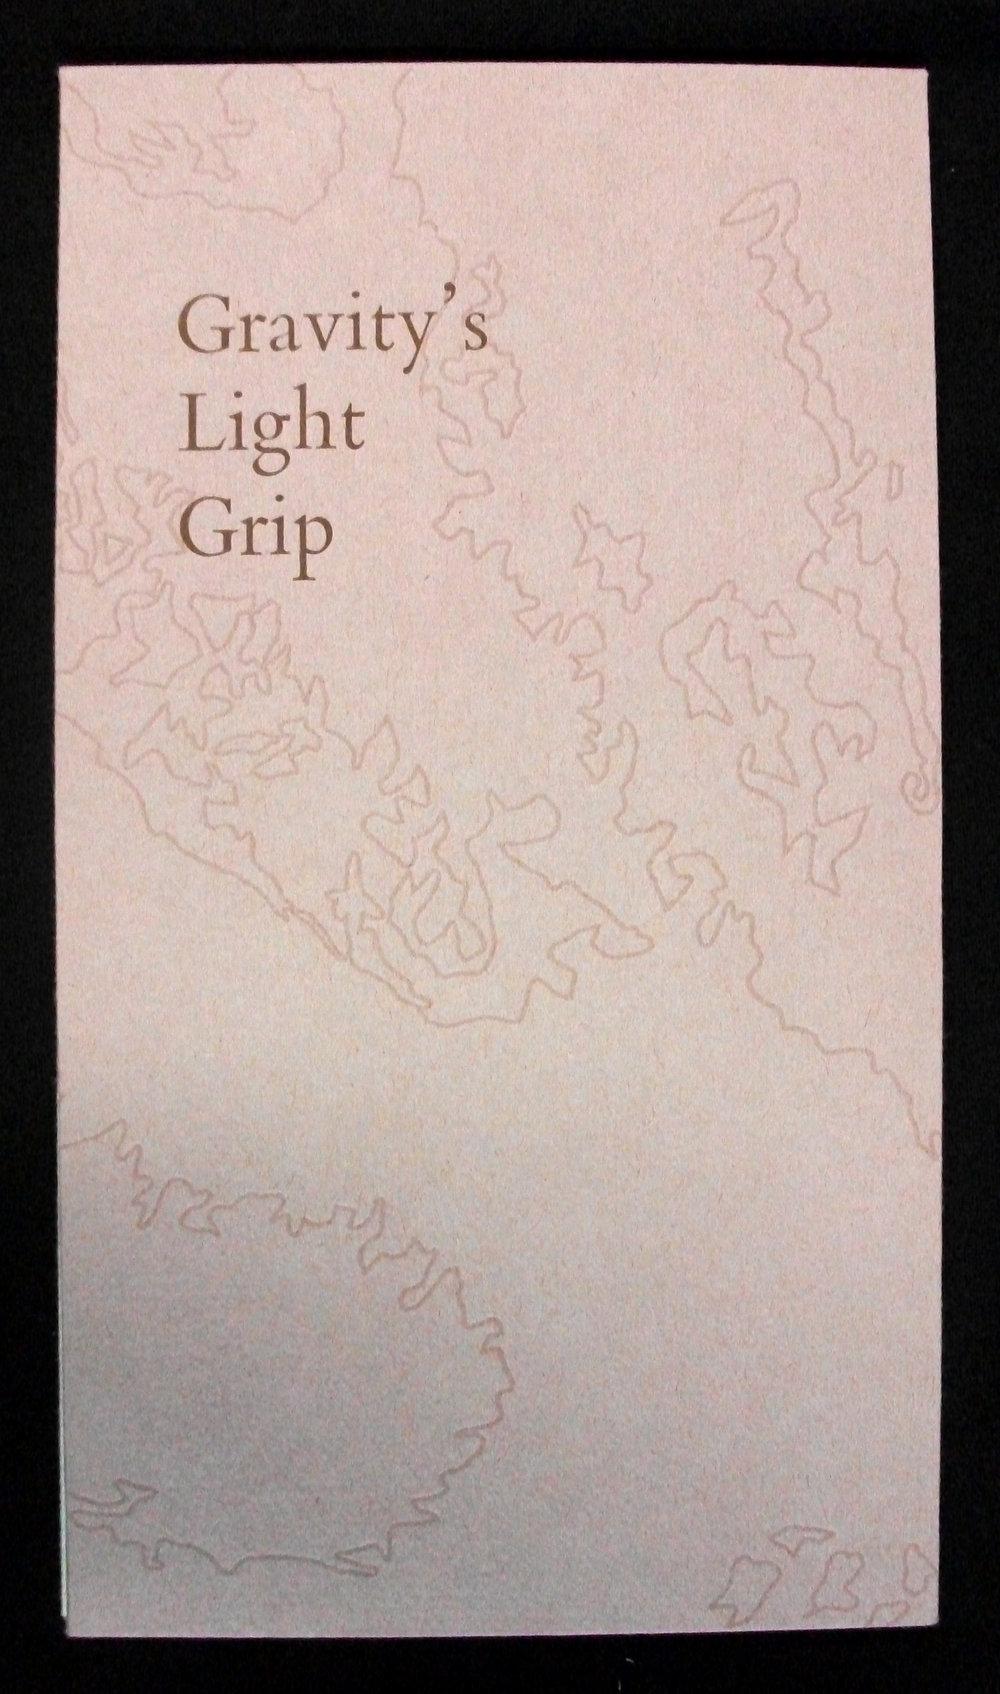 AmyPirkle,  Gravity's Light Grip,  Letterpress and Reduction Linocut, 2007, Tuscaloosa, AL